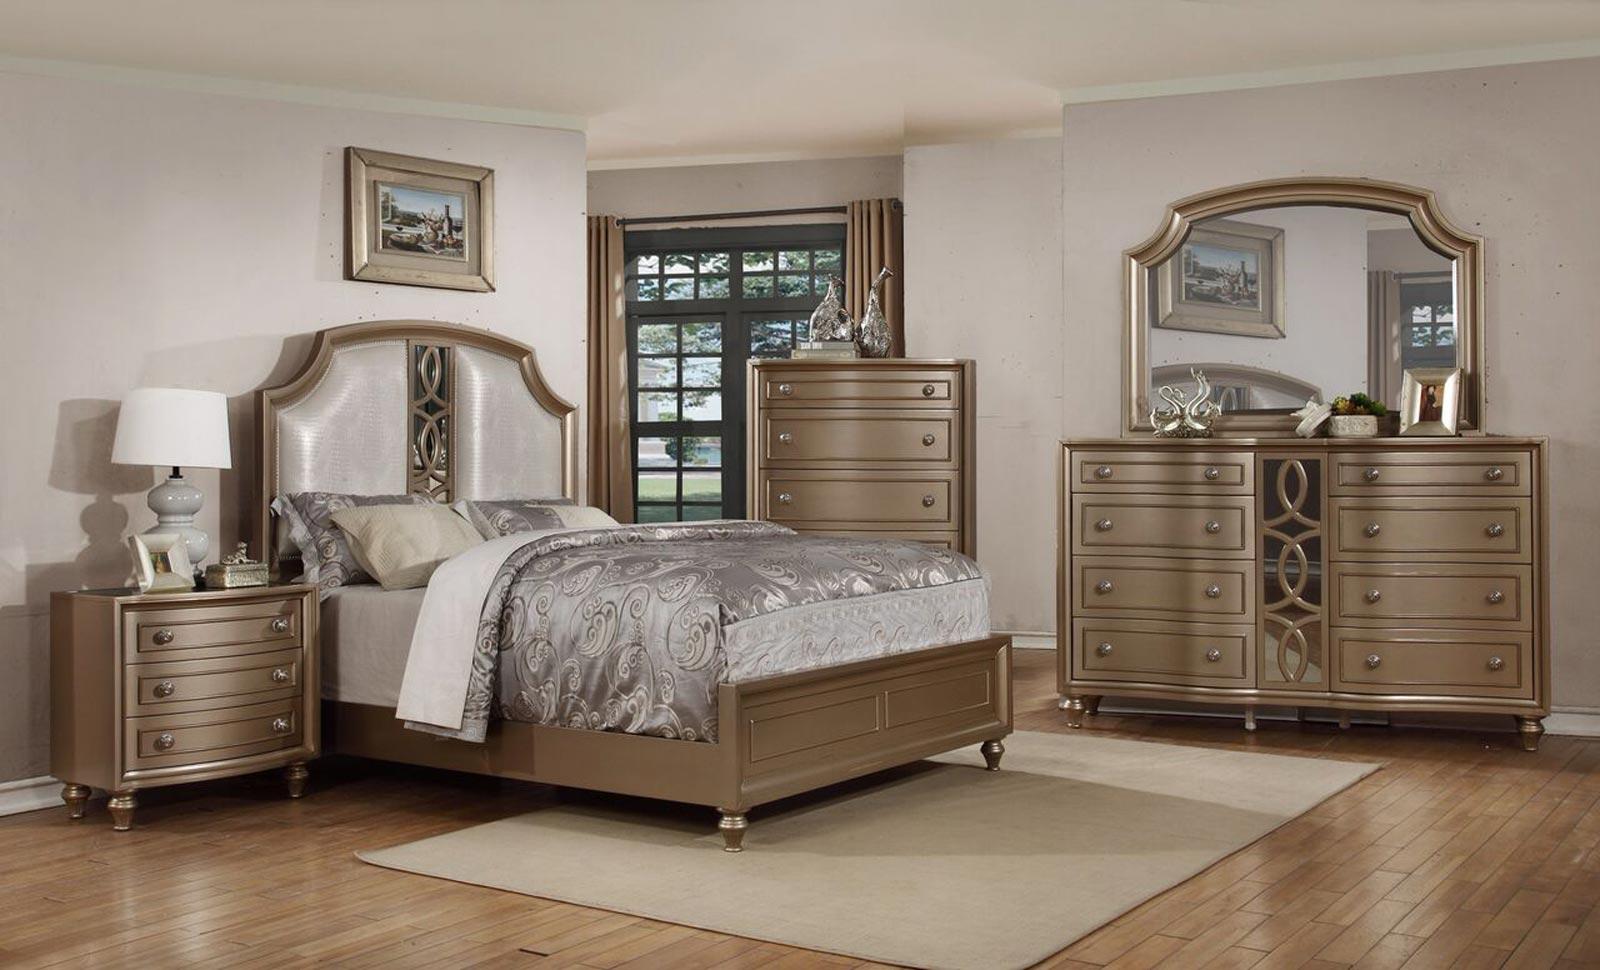 Regency Park 4 Piece Bedroom Set. By Avalon Furniture